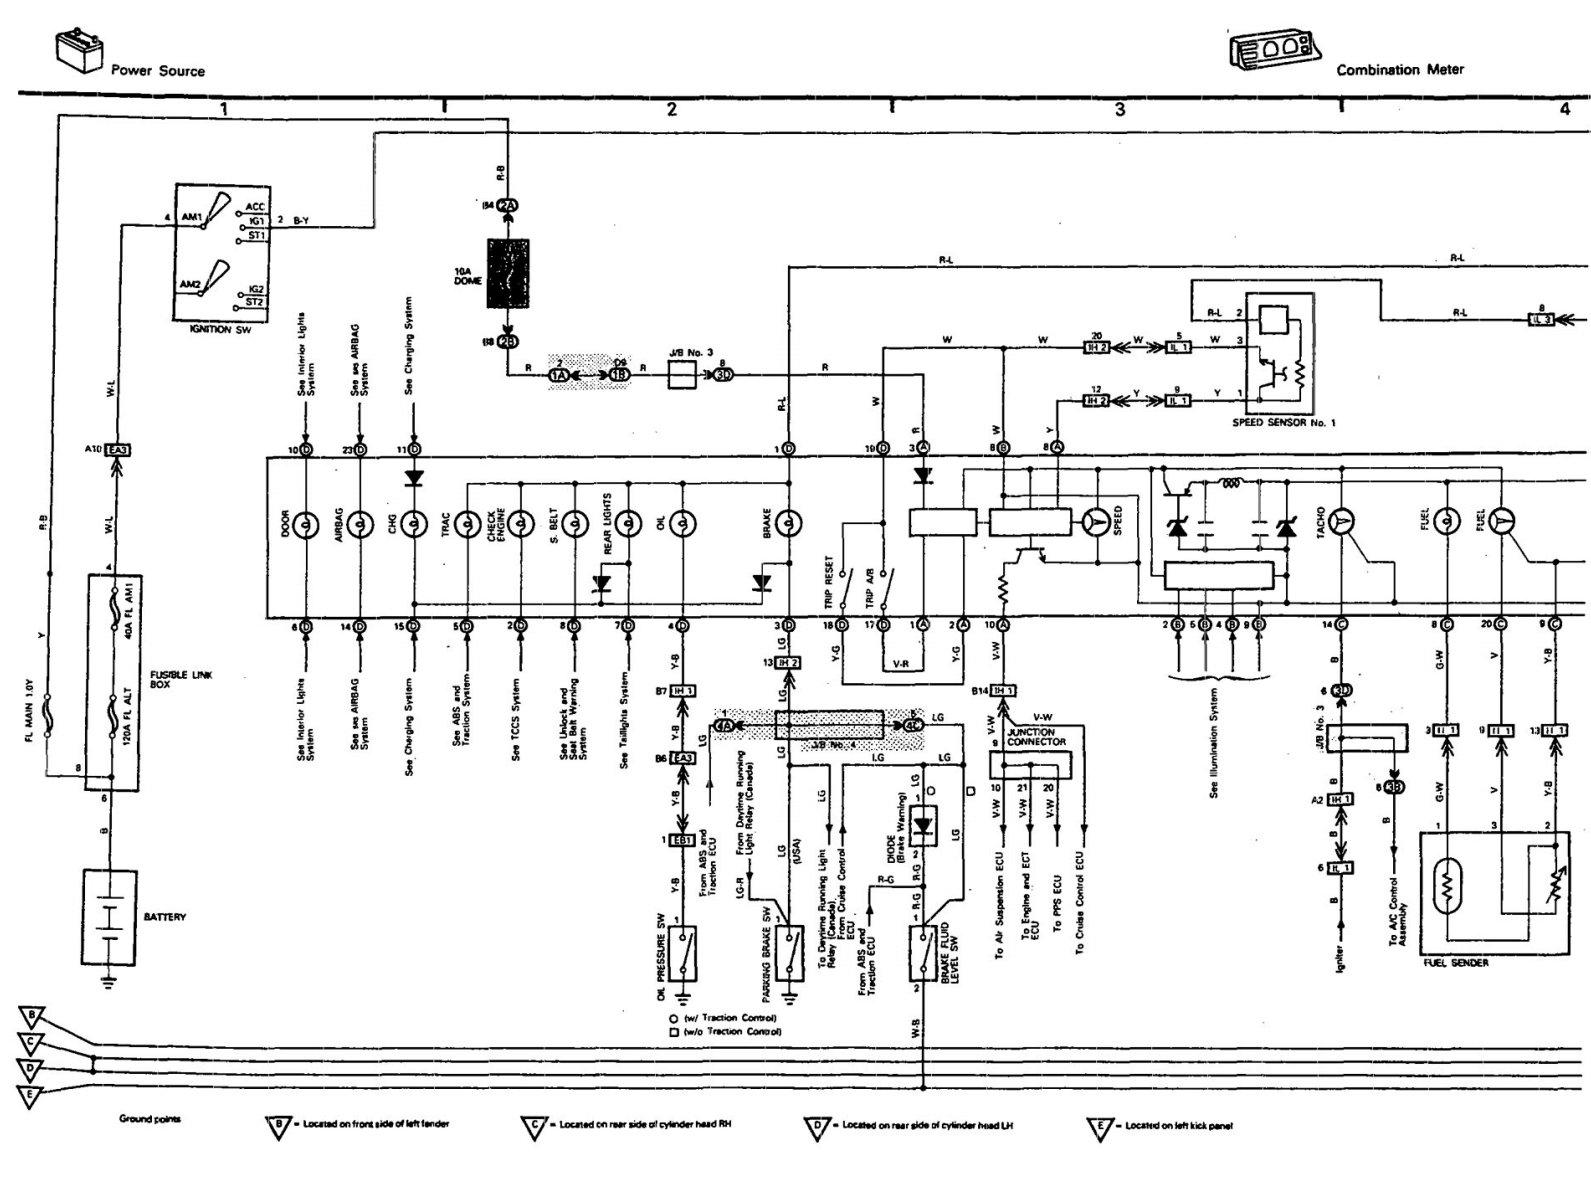 hight resolution of lexus rx350 wiring diagram wiring diagram schematics 2010 lexus rx 350 wiring diagram lexus rx350 wiring diagram